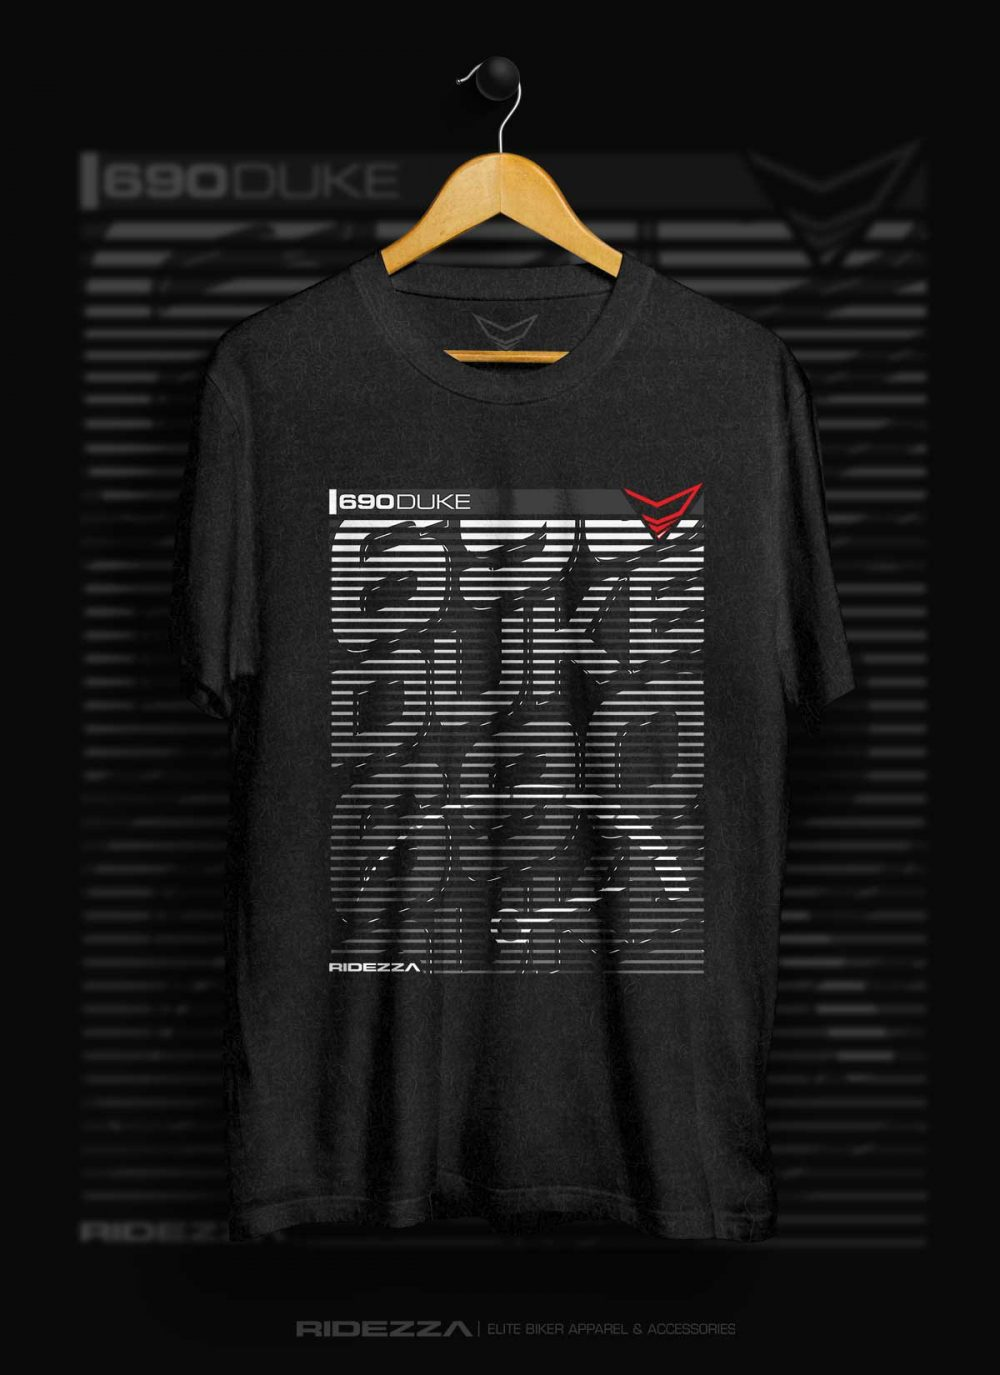 df1c9826 KTM 690 Duke Speedy T-Shirt | Ridezza